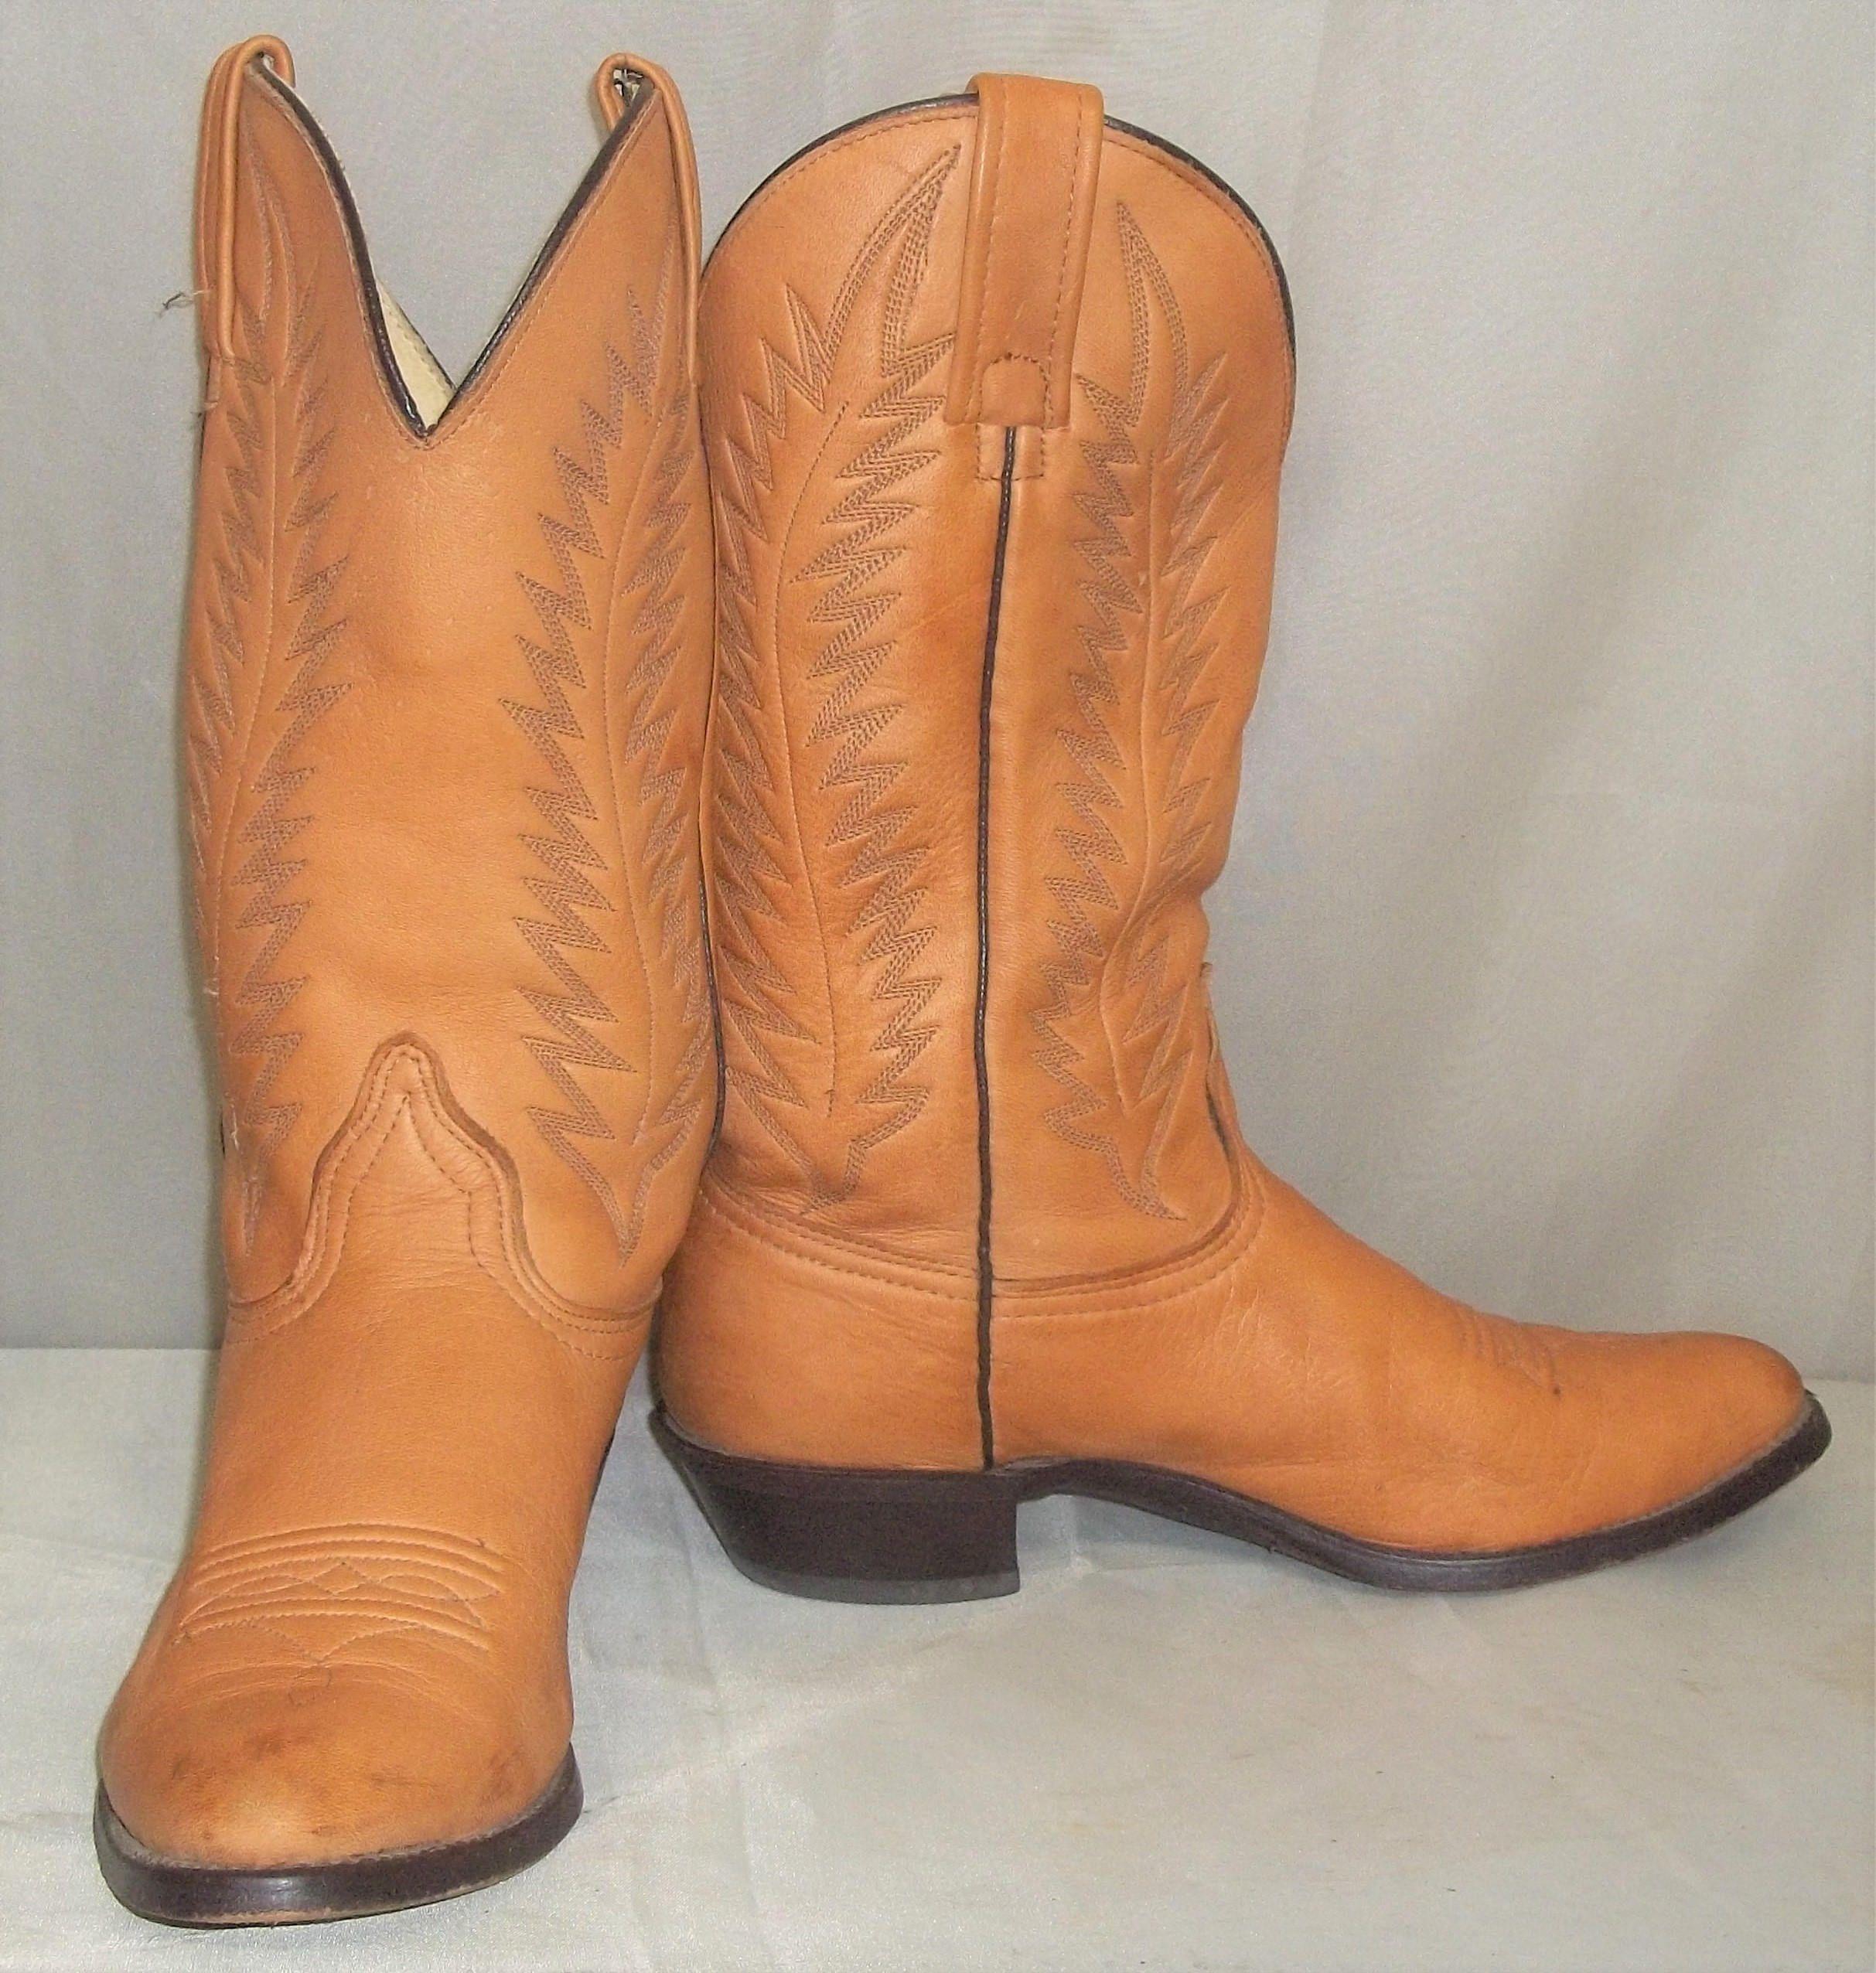 Vintage Texas Nubuck Leather Cowboy Western Boots Girls